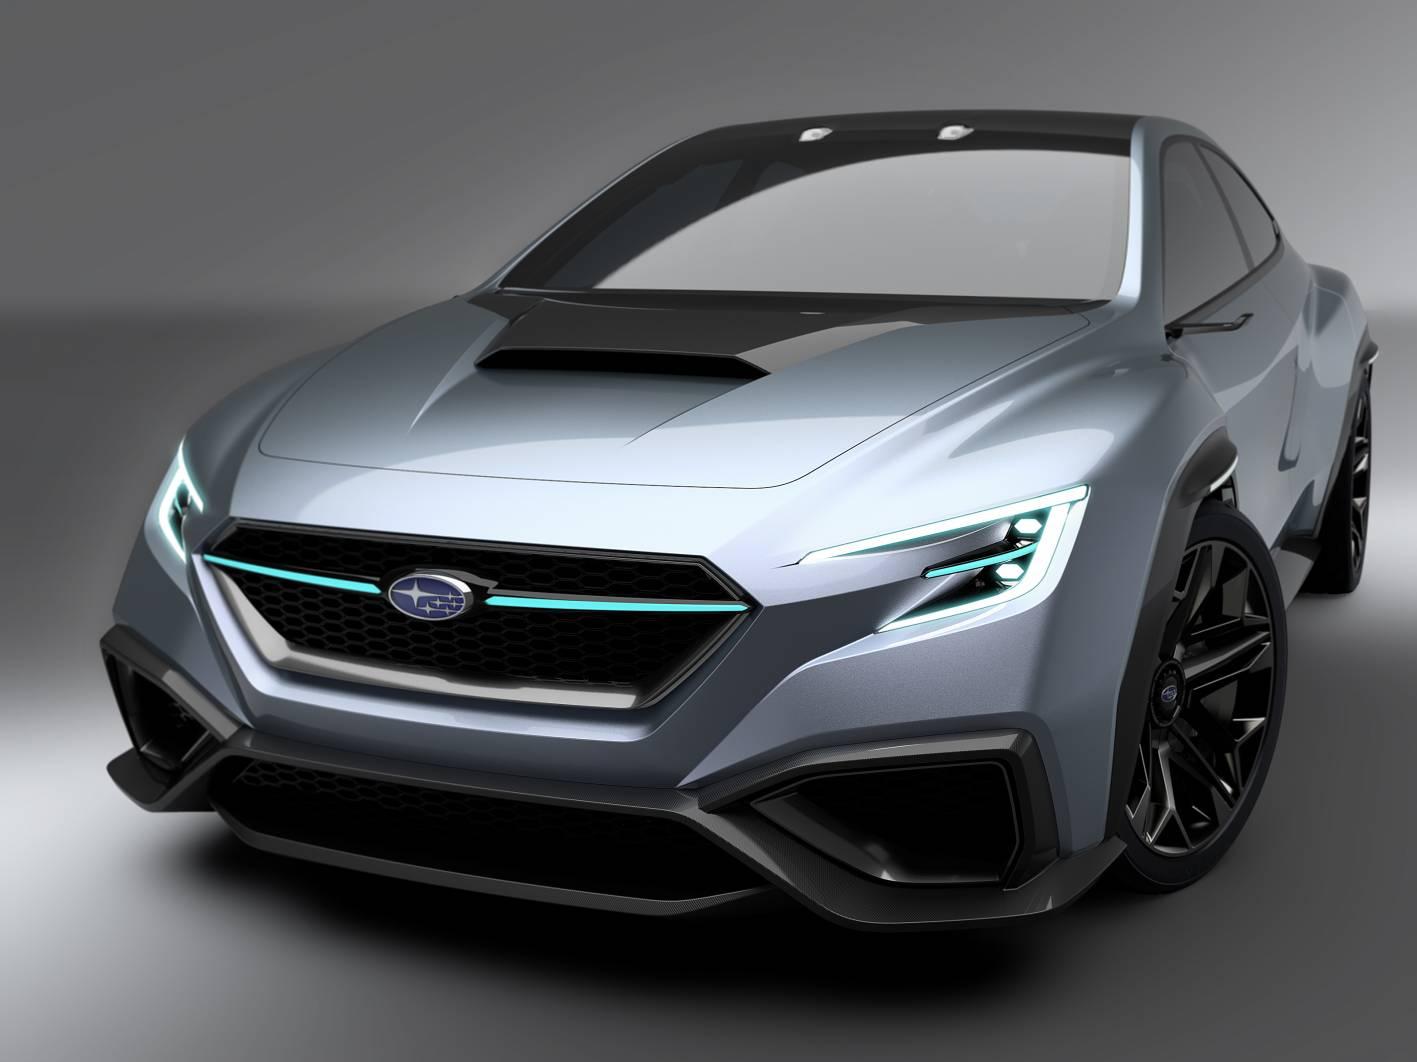 Subaru Wrx Sti Impreza 2017 >> Subaru VIZIV Performance Concept previews next-gen WRX / WRX STI - ForceGT.com